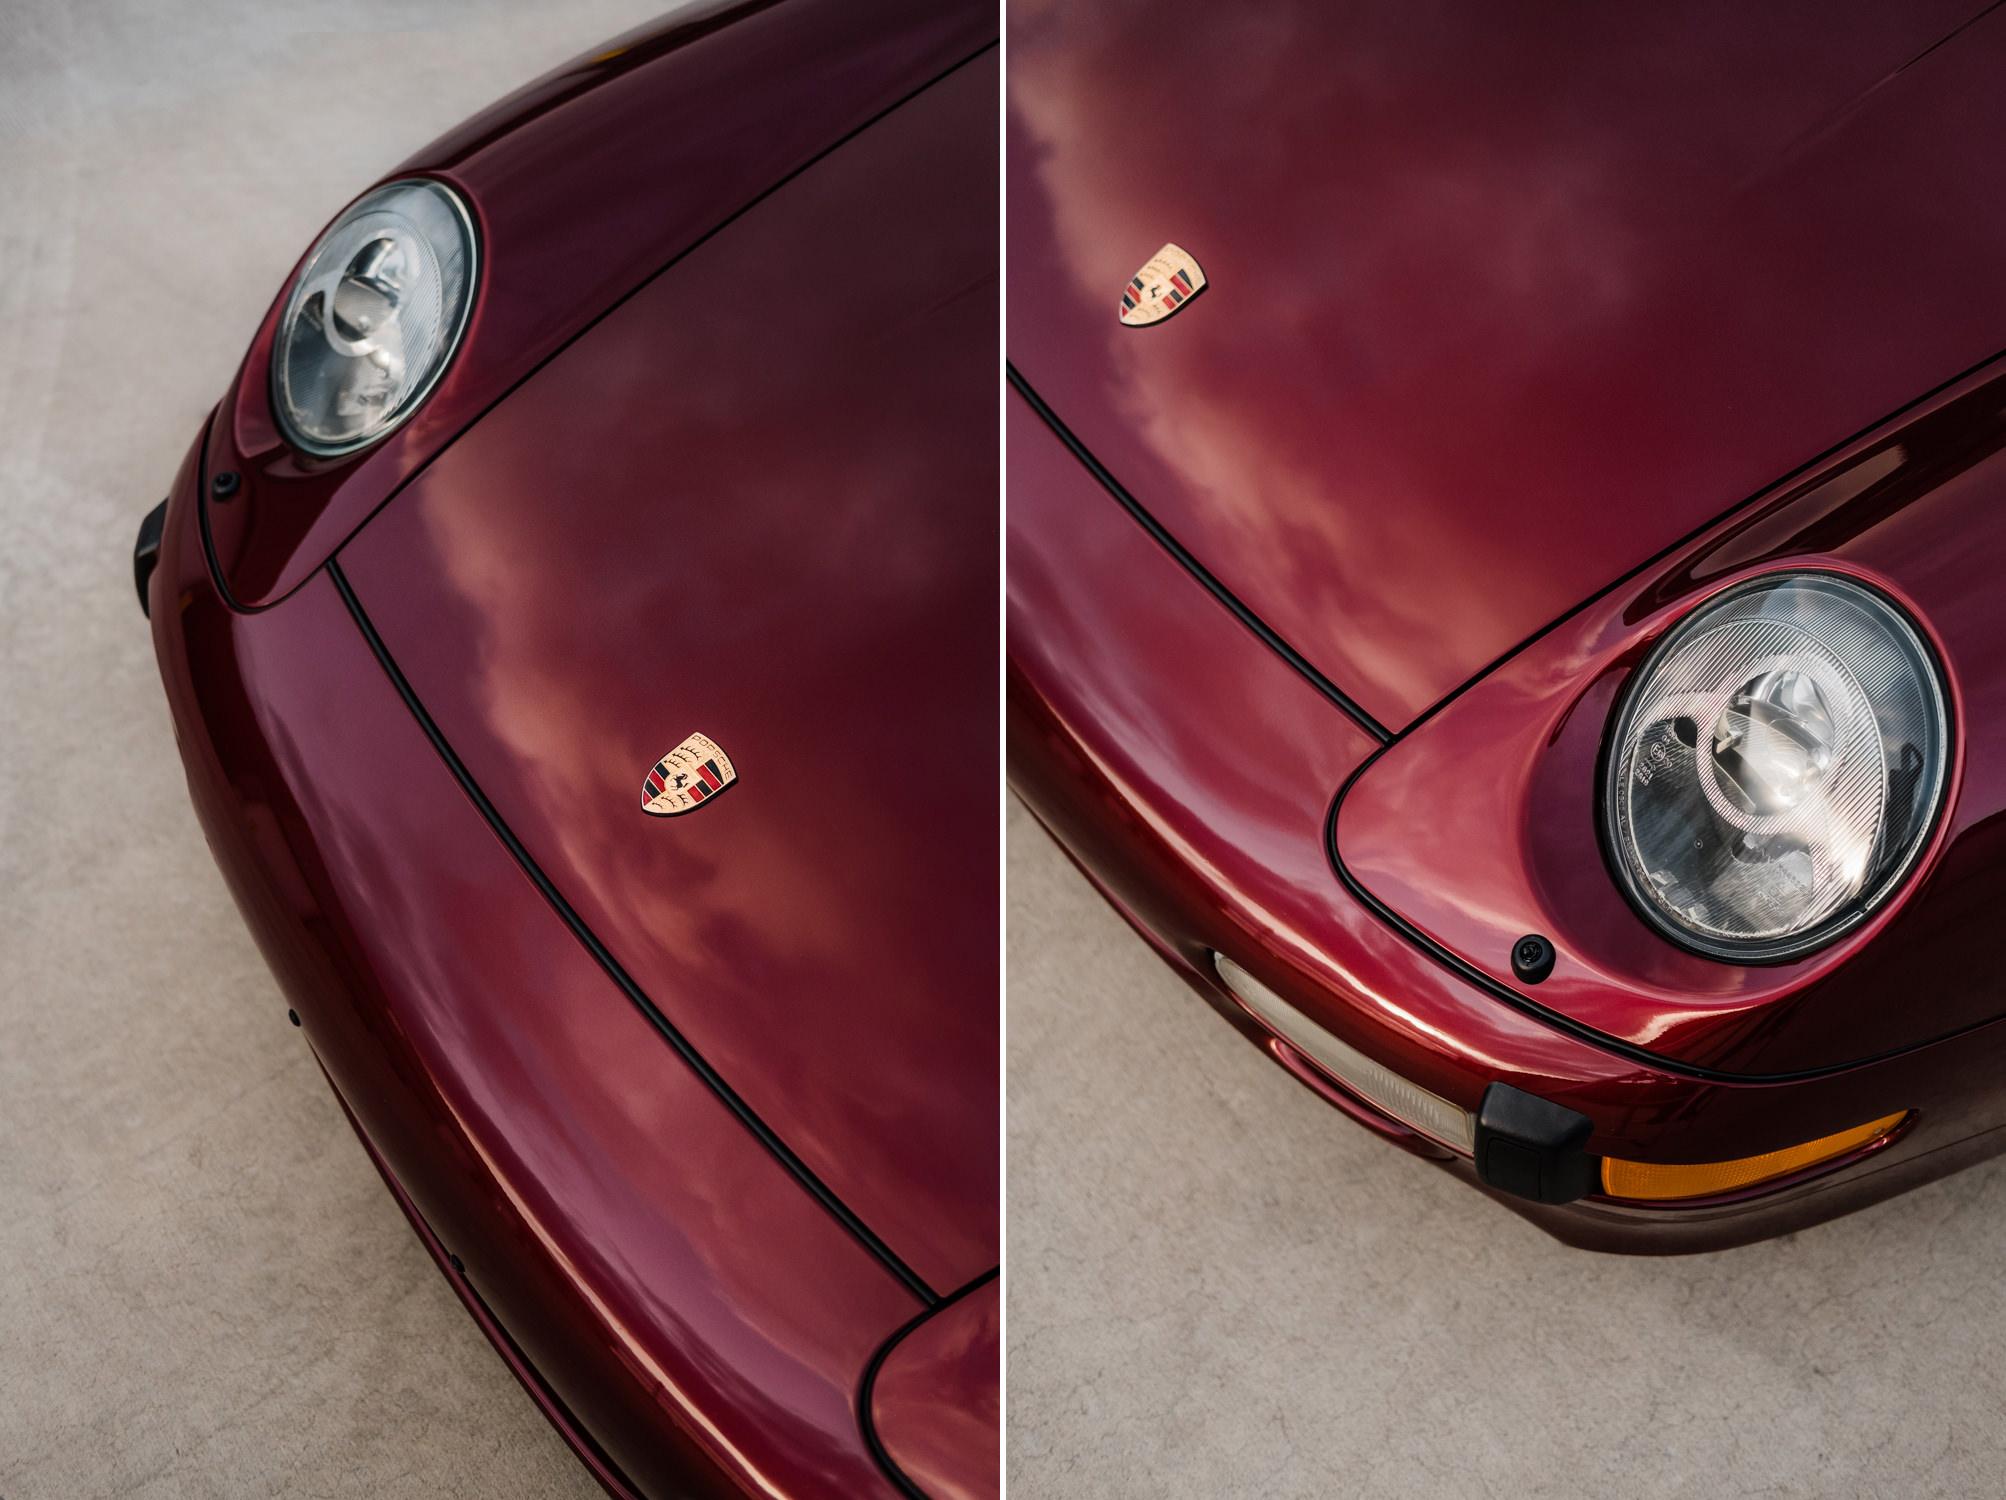 Porsche 911 Carrera 4S-Porsche 993-Porsche 911-Paint Correction-Car Wash-Car Detailing-108.jpg